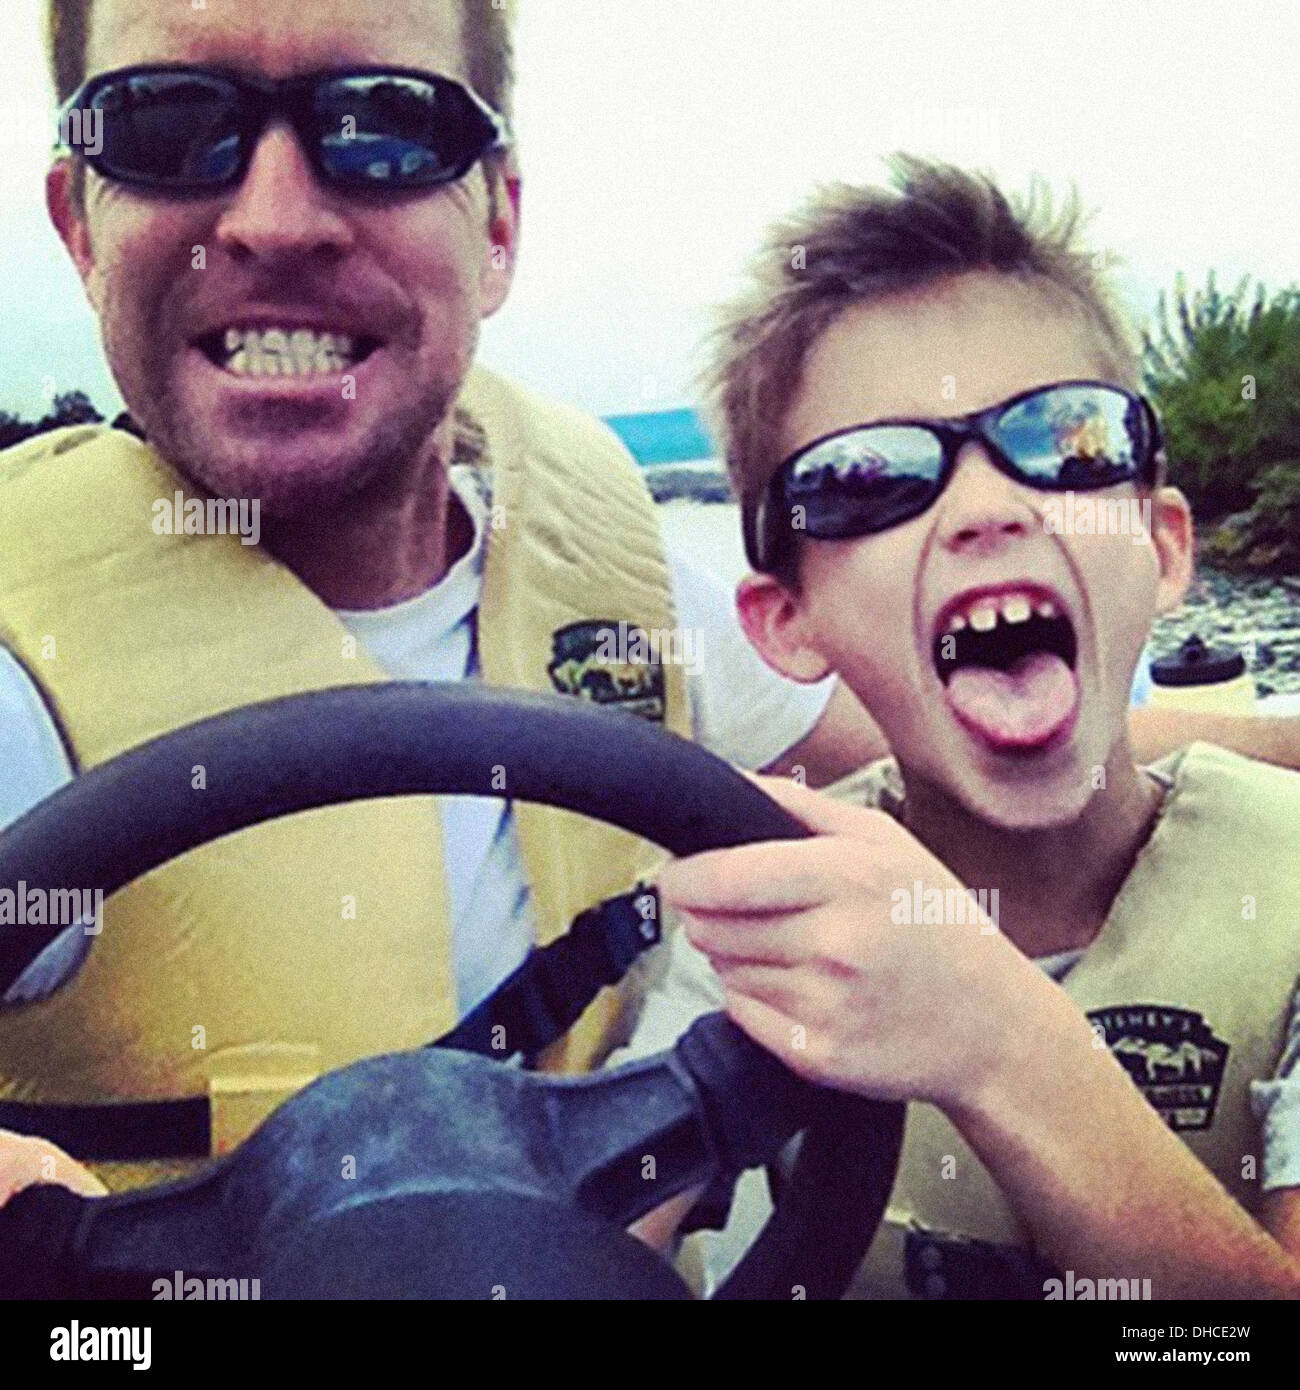 Padre e hijo a divertirse, detrás de la rueda del barco, Cerrar Imagen De Stock